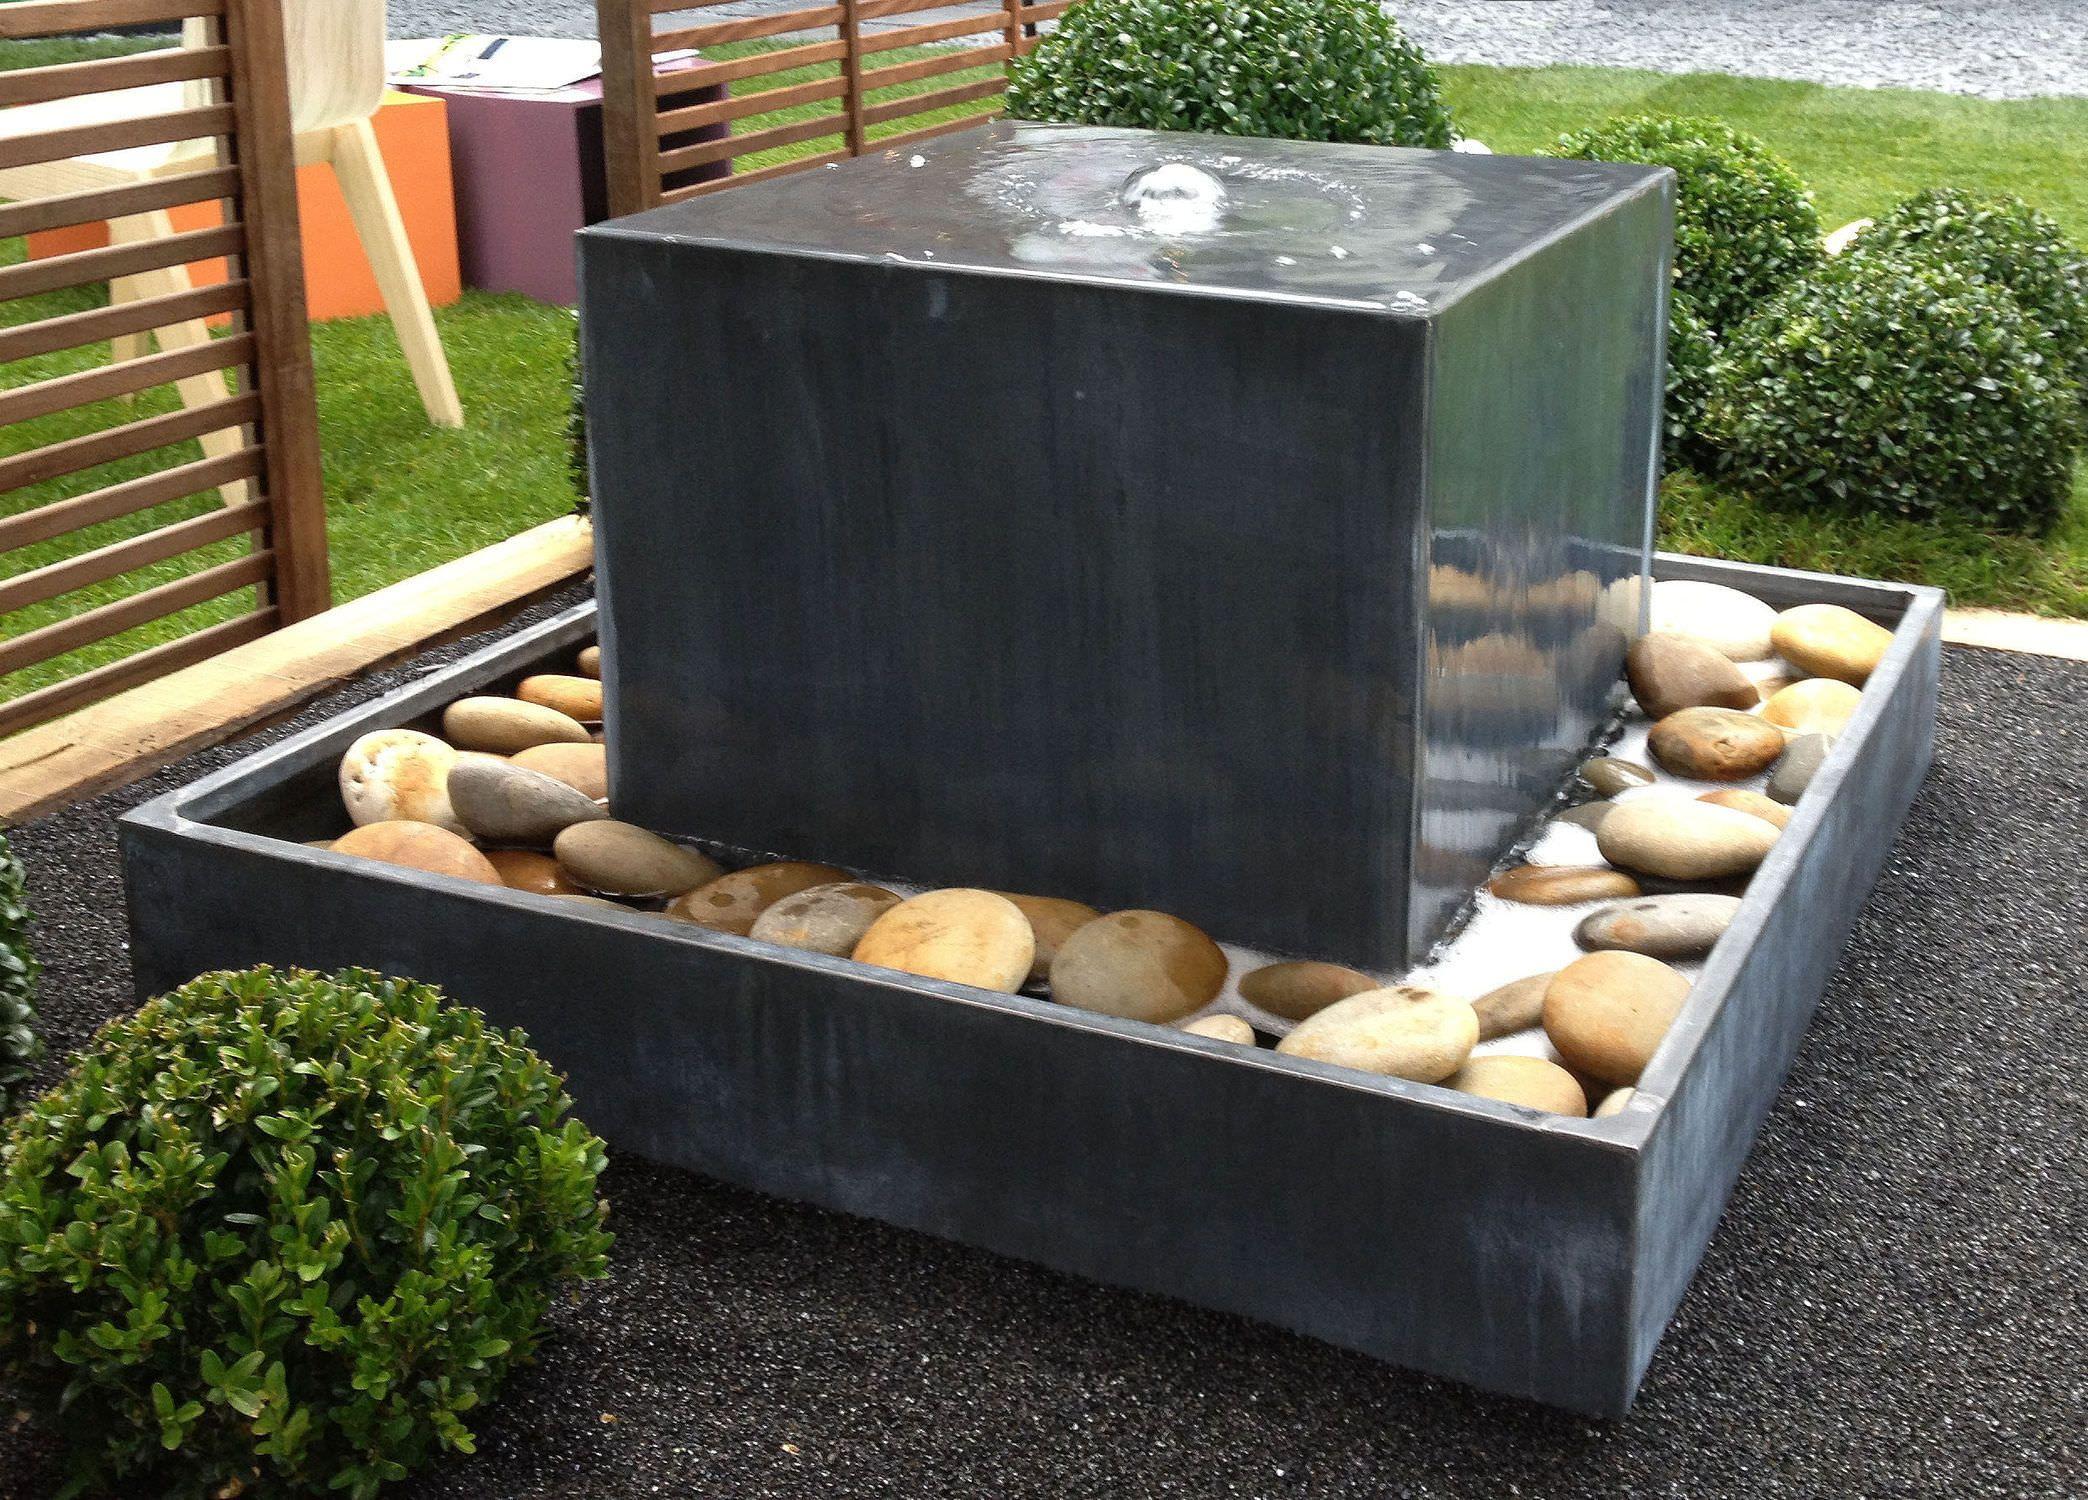 Fontaine De Jardin / En Zinc Fontaine Zinc Cube Tonton ... serapportantà Fontaine Exterieure De Jardin Moderne